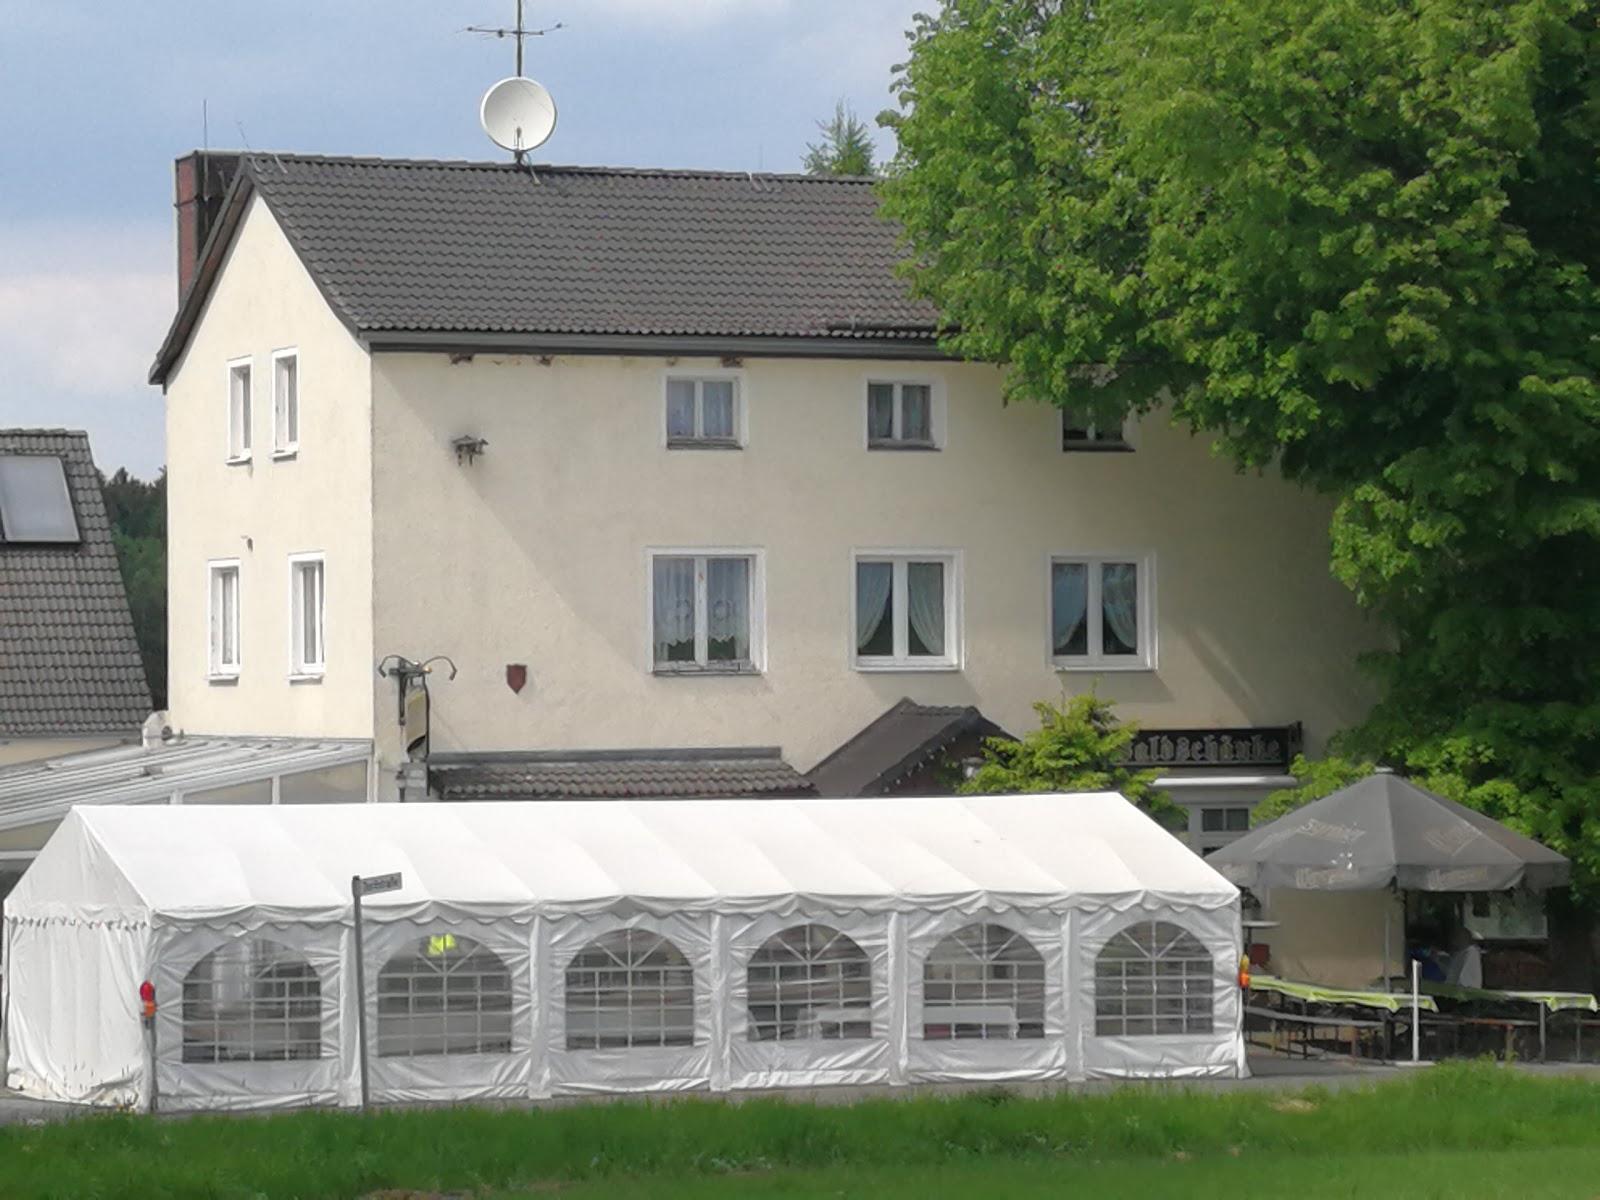 Anton-Günther-Hütte - Tripcarta